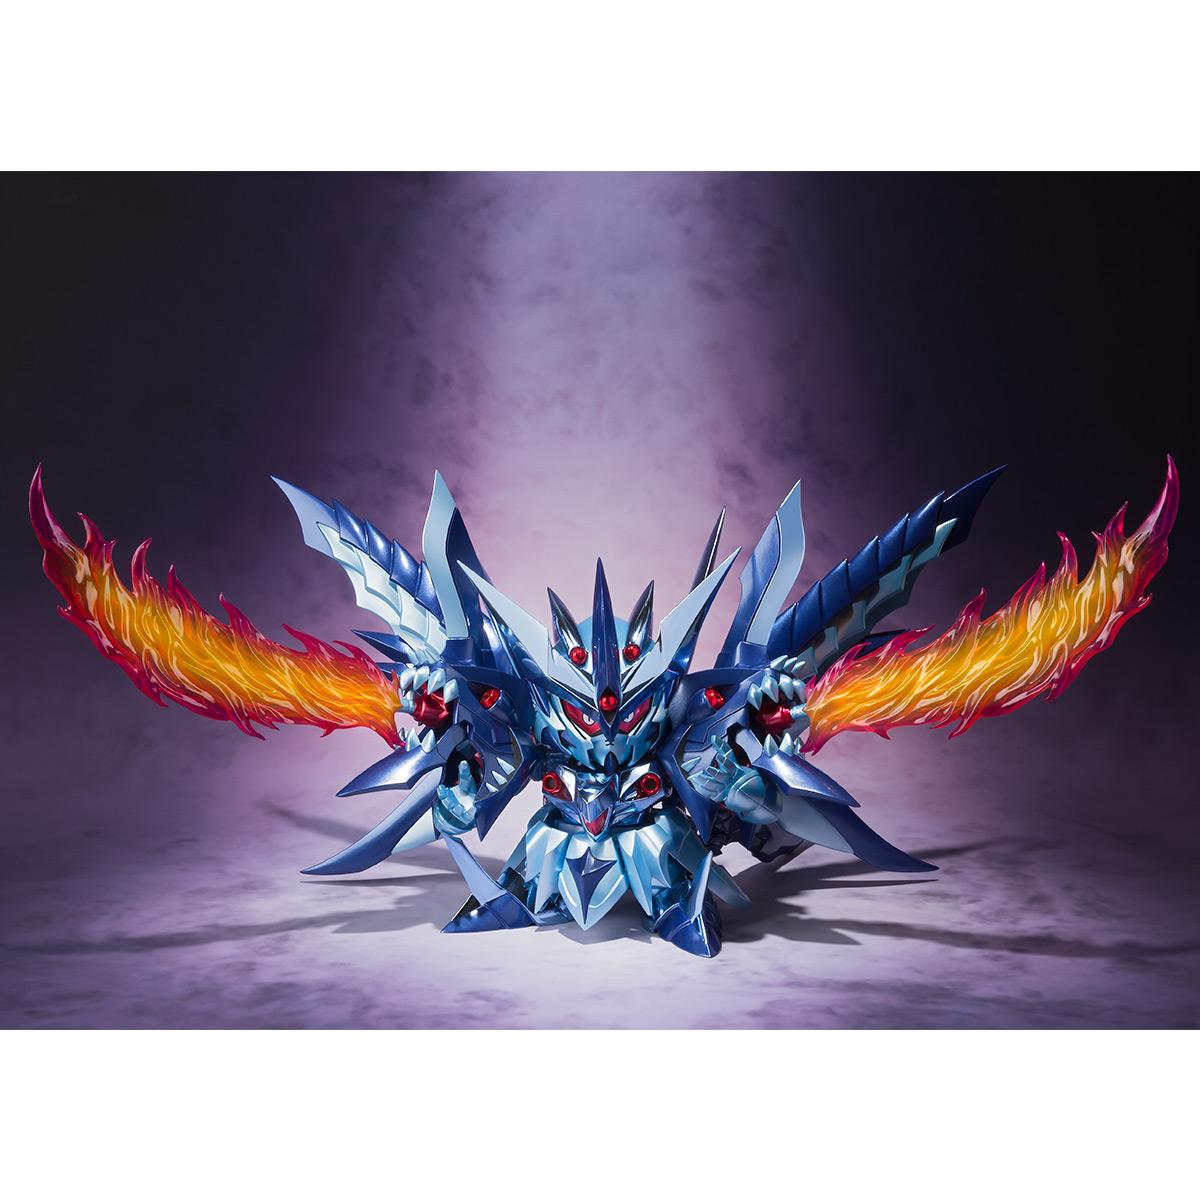 img_sdx_superior_dragon_dark_02_gec.jpg